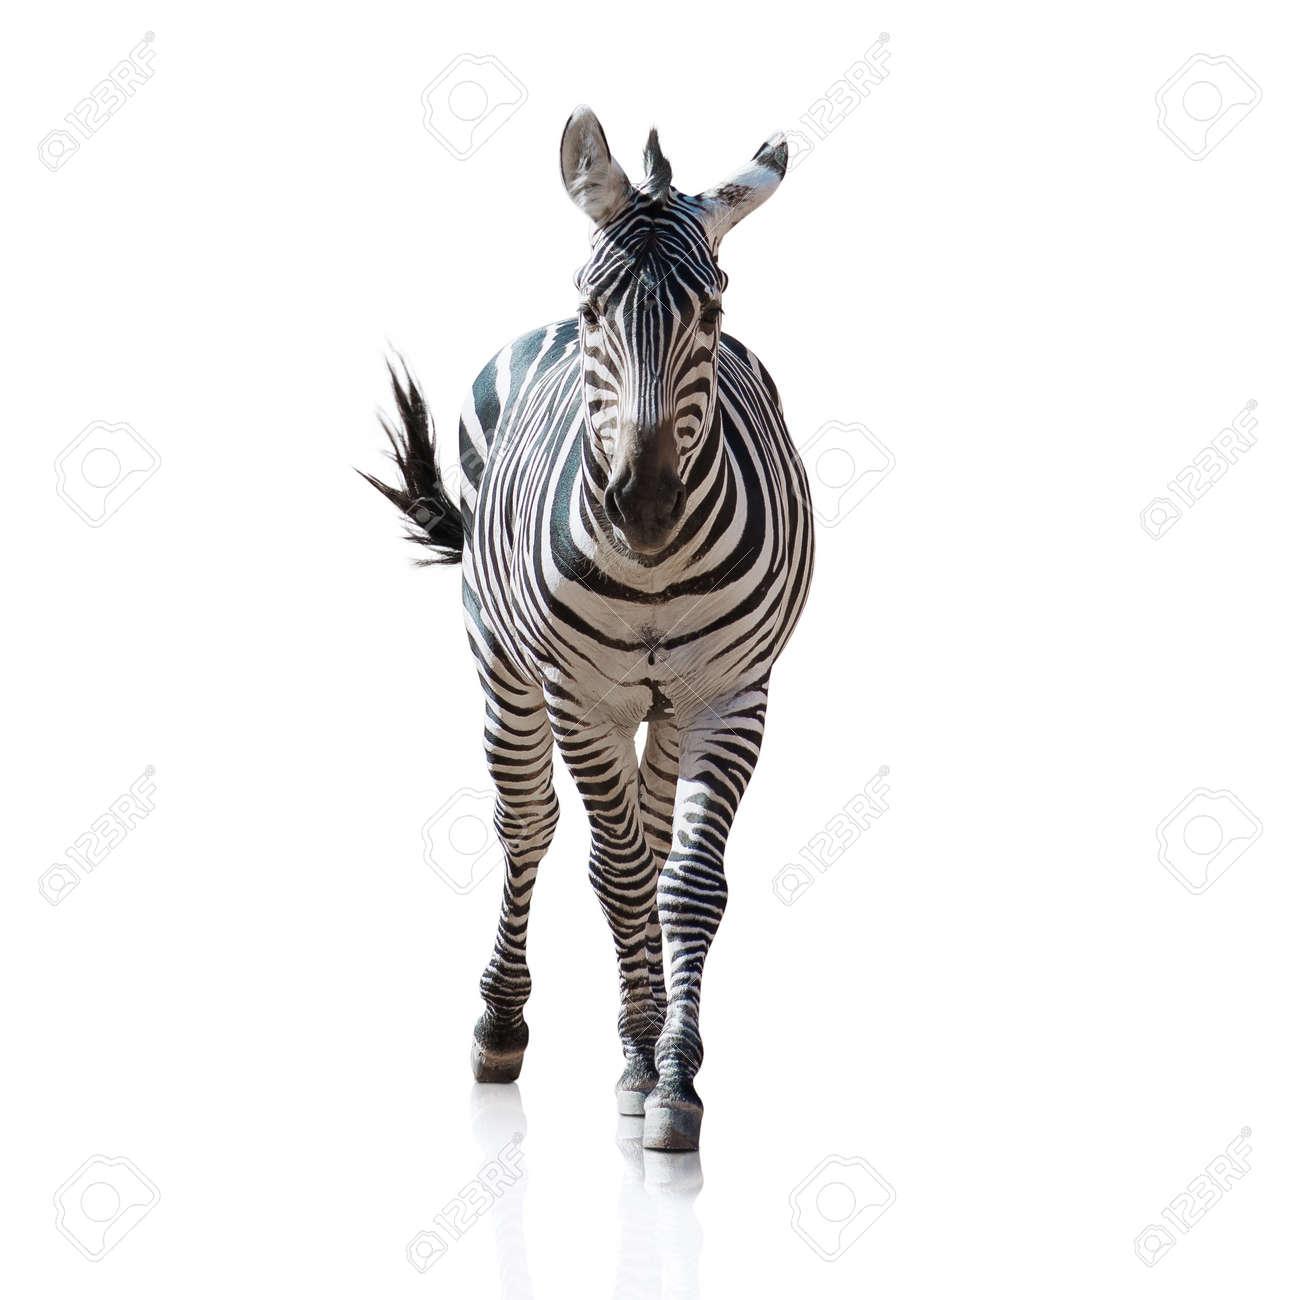 burchell zebra stock photos royalty free burchell zebra images